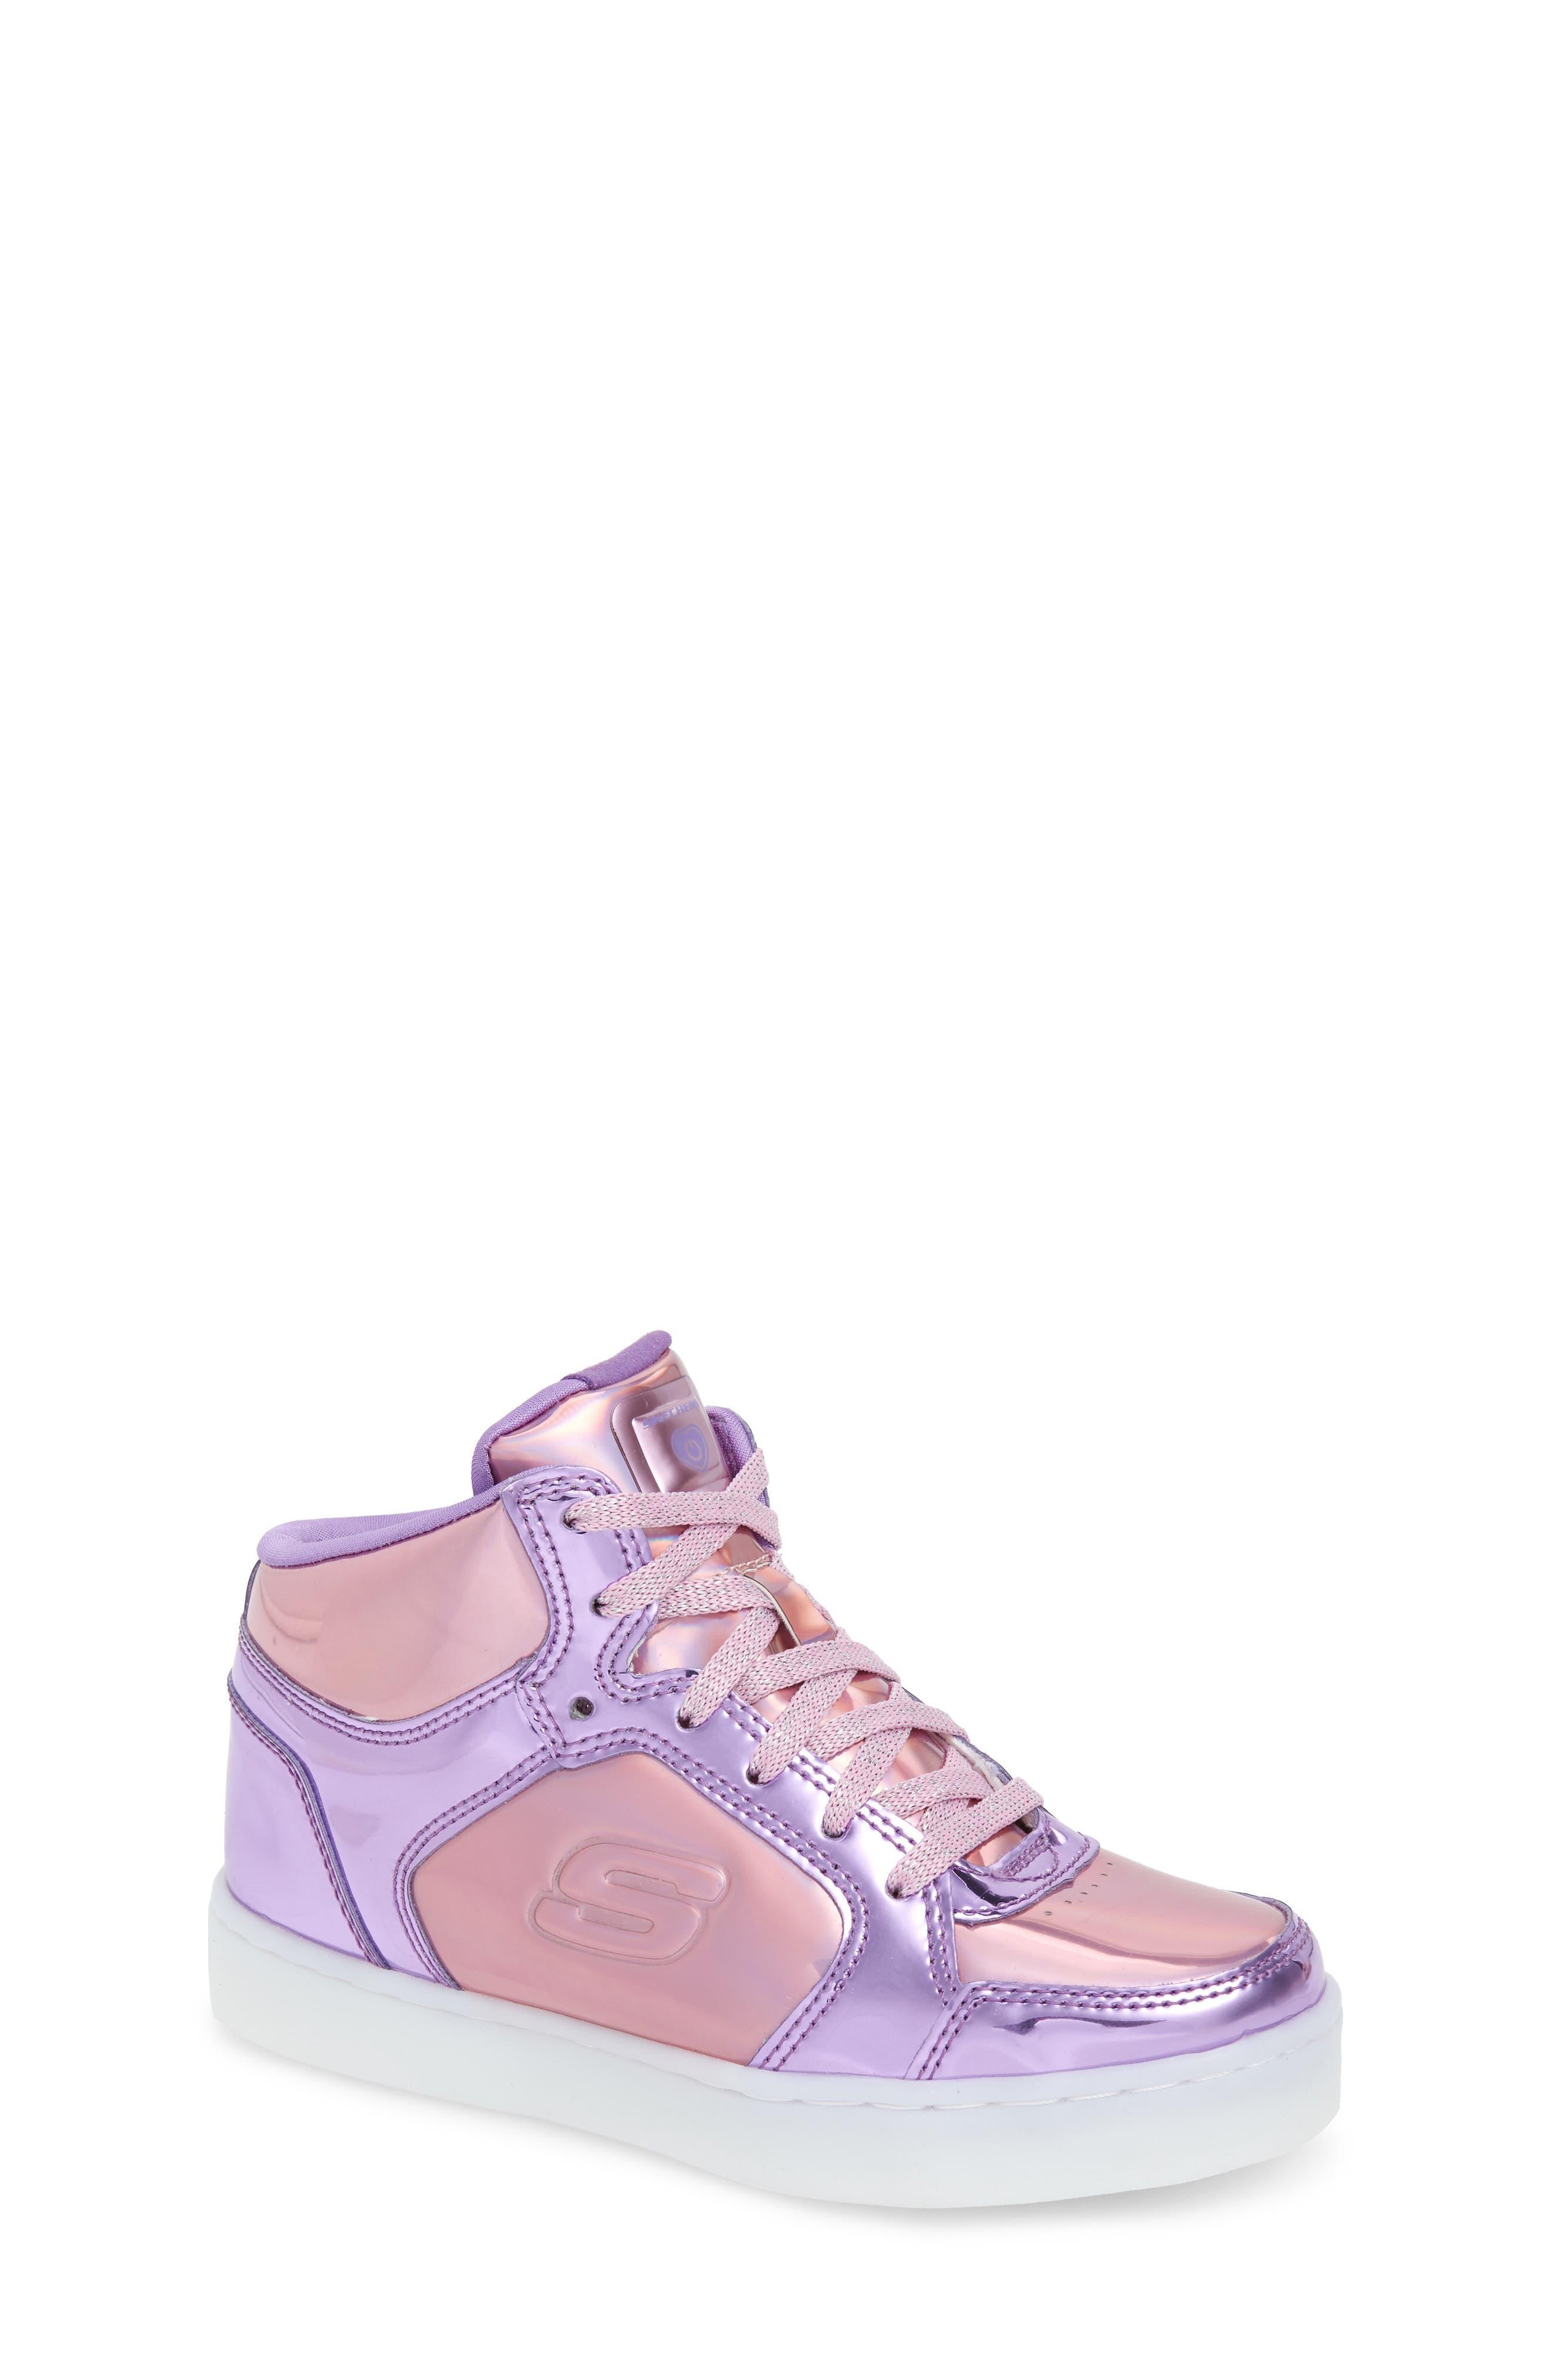 Energy Lights Metallic High Top Sneaker,                             Alternate thumbnail 7, color,                             Pink/ Purple